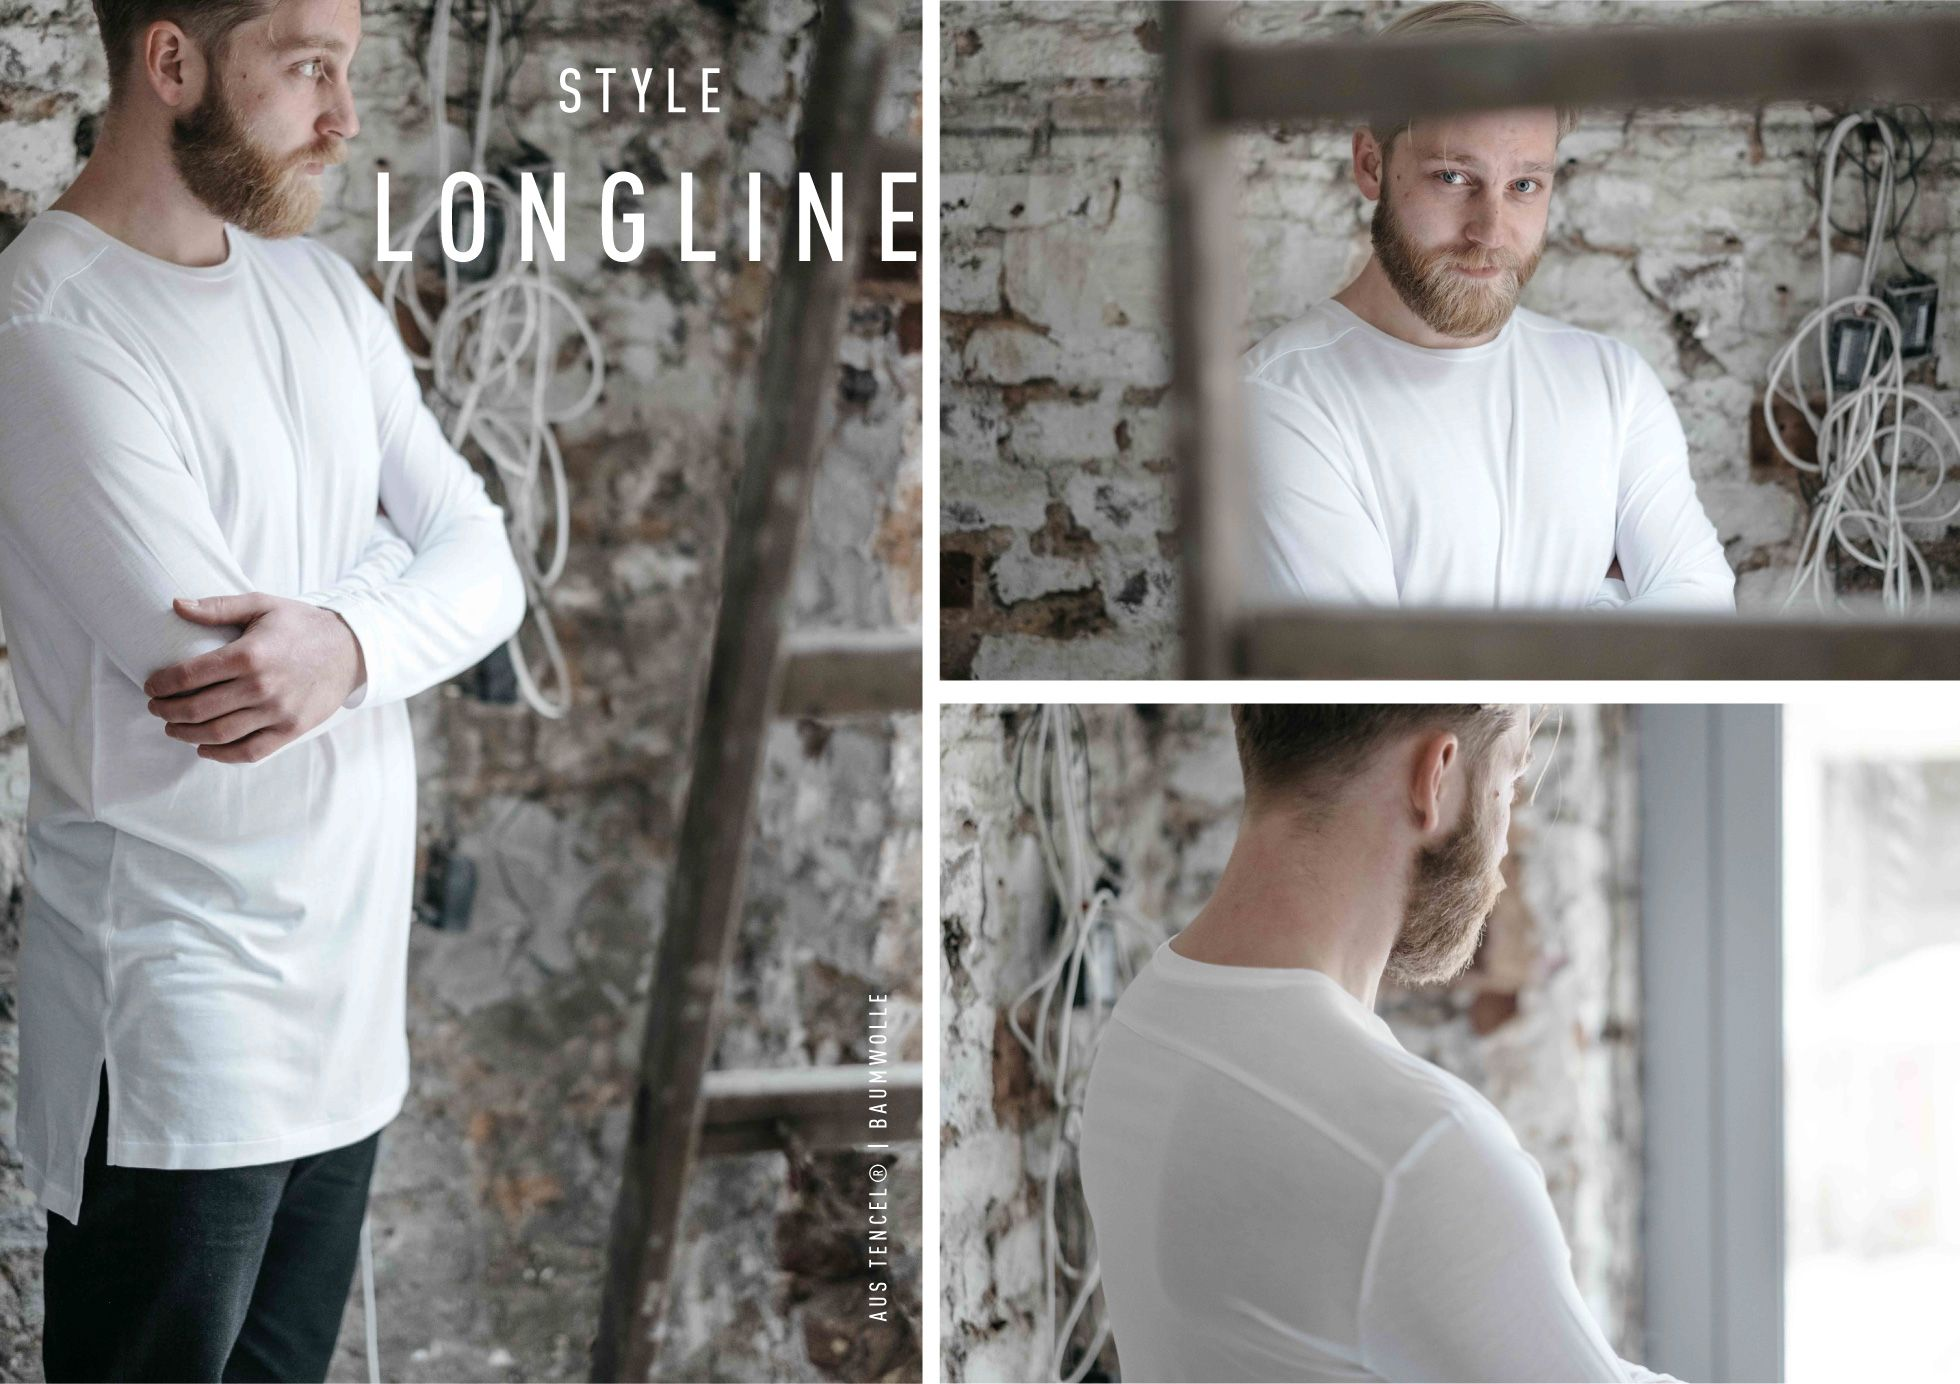 Fotostrecke: THE WHITE CANVAS II – Funktion Schnitt #funktionschnitt #menswear #mensfashion #basics #whiteshirt #longseleeve